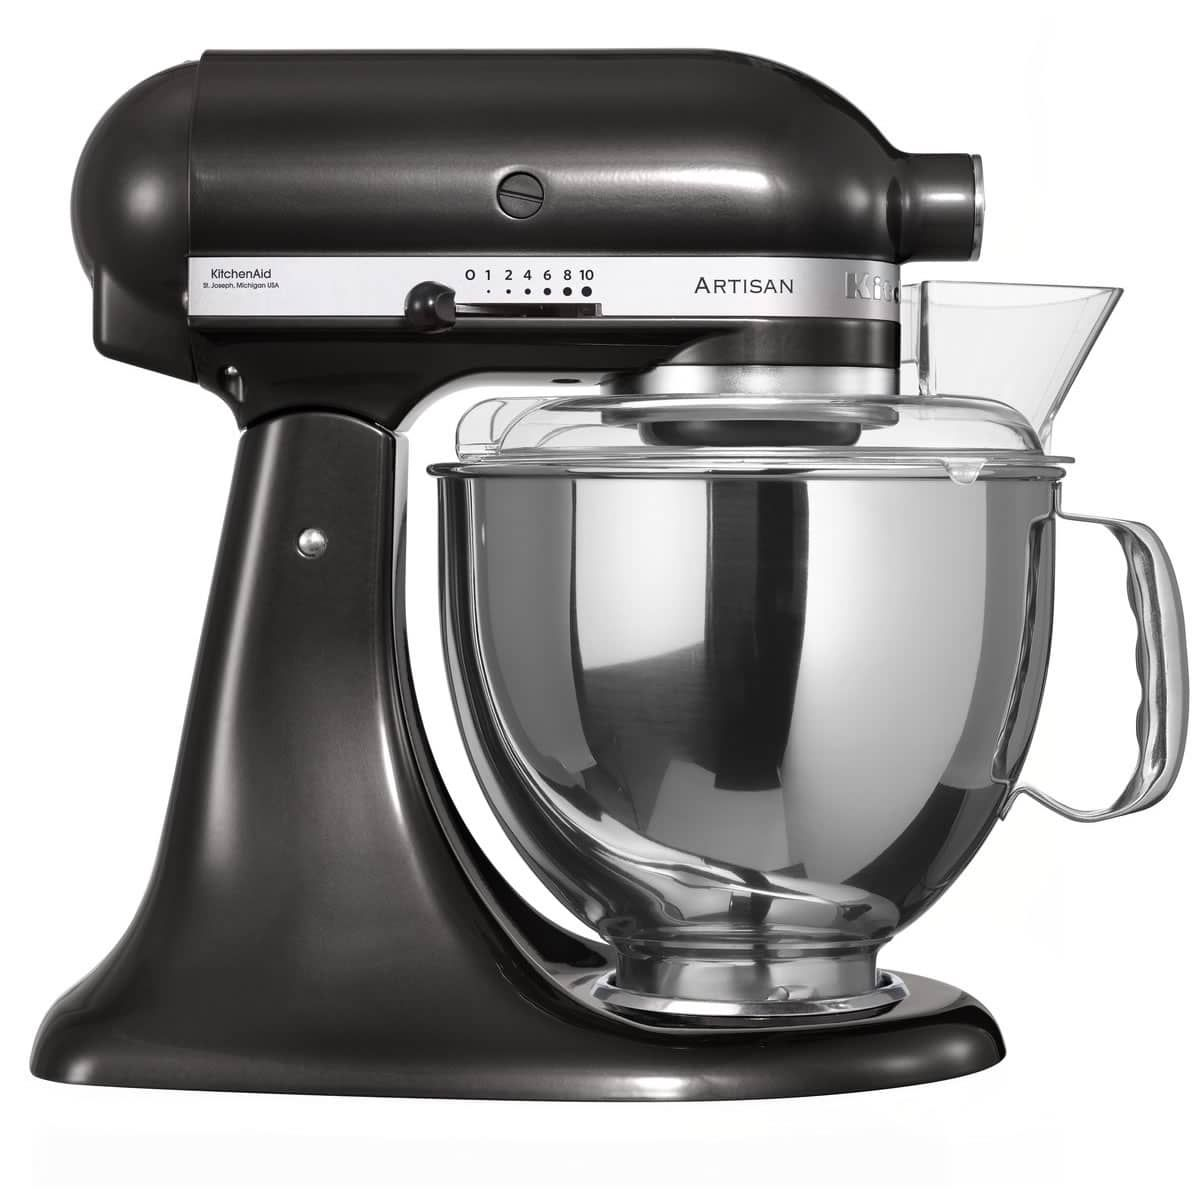 Kitchenaid artisan mixer 48l black storm ksm150psbz